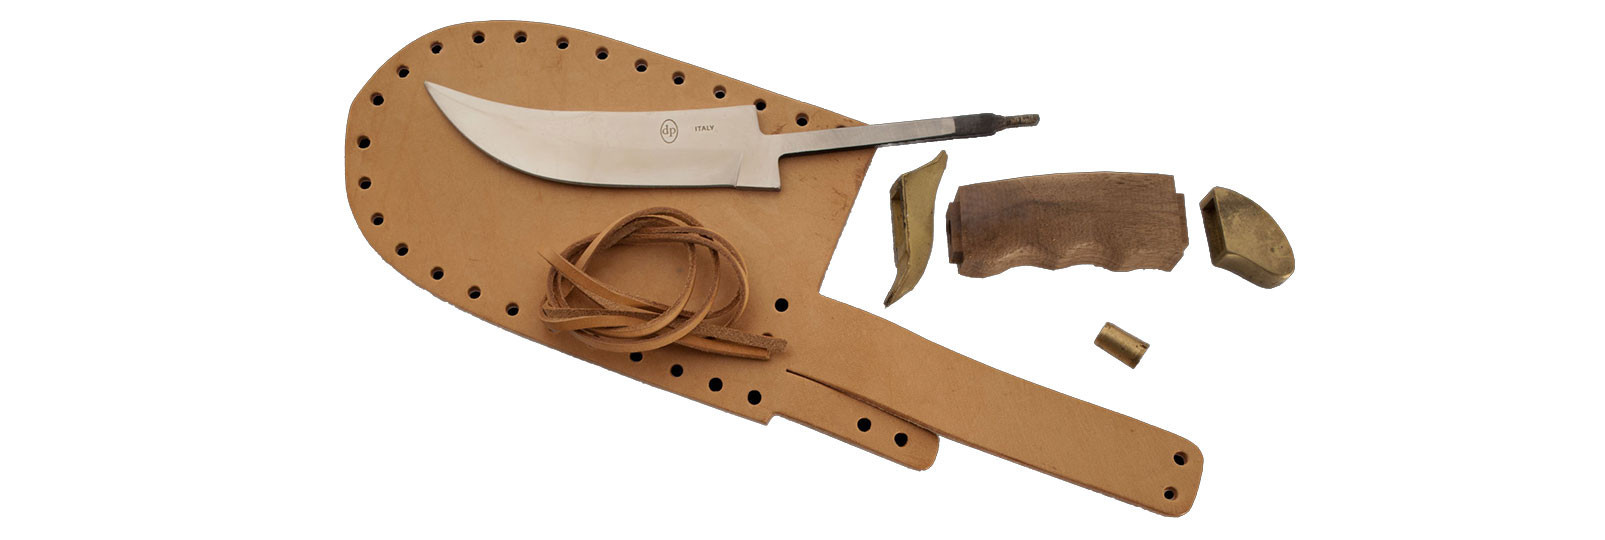 Skinner Knife kit with sheath